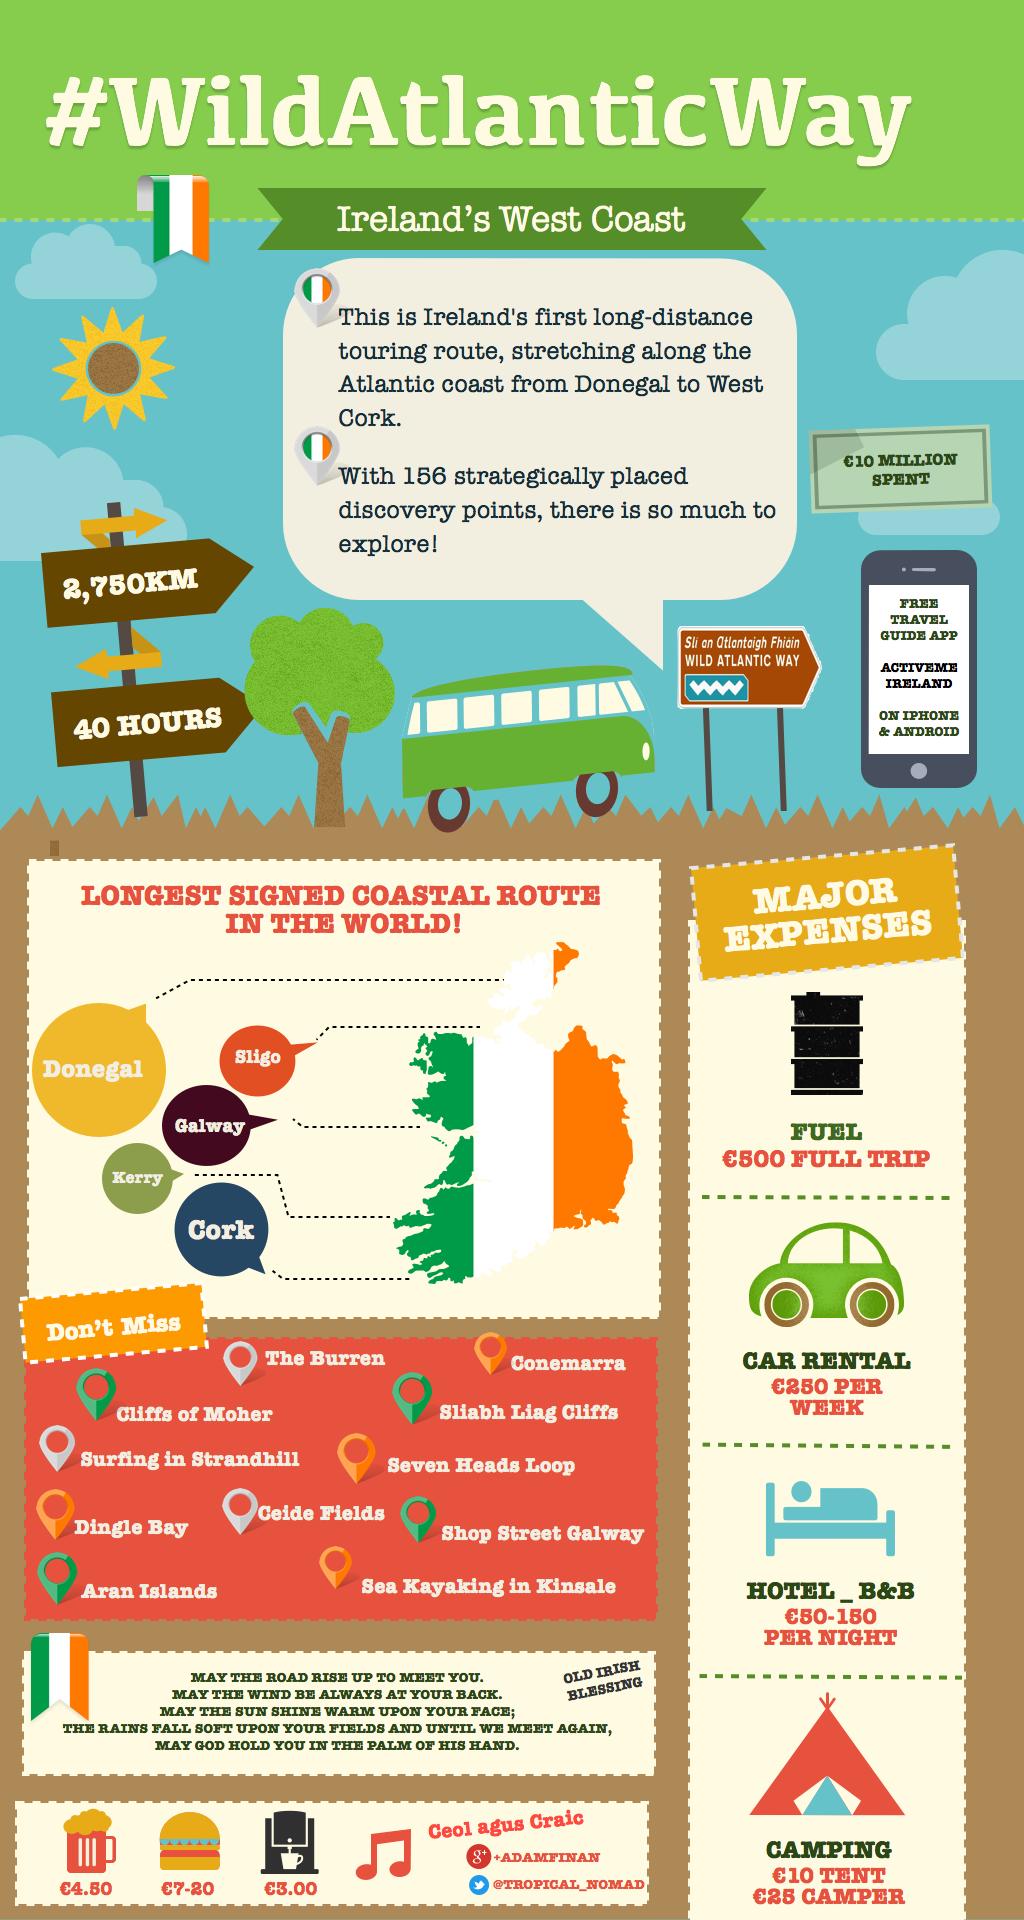 wild-atlantic-way-ireland-infographic_53513549a4703.png